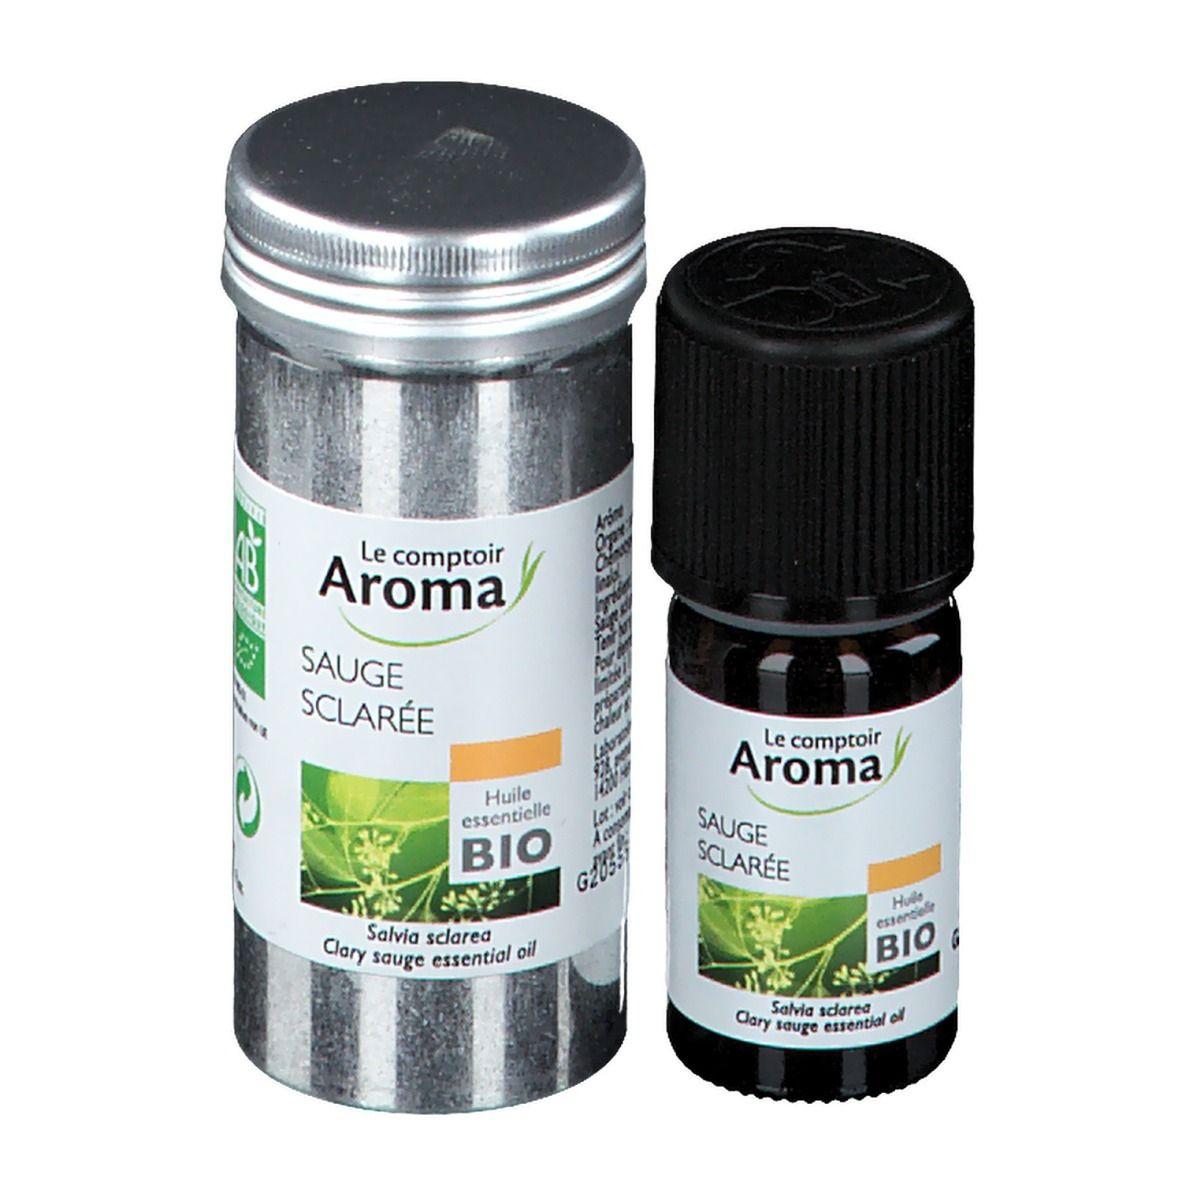 Le Comptoir Aroma huile essentielle Sauge sclarée ml huile